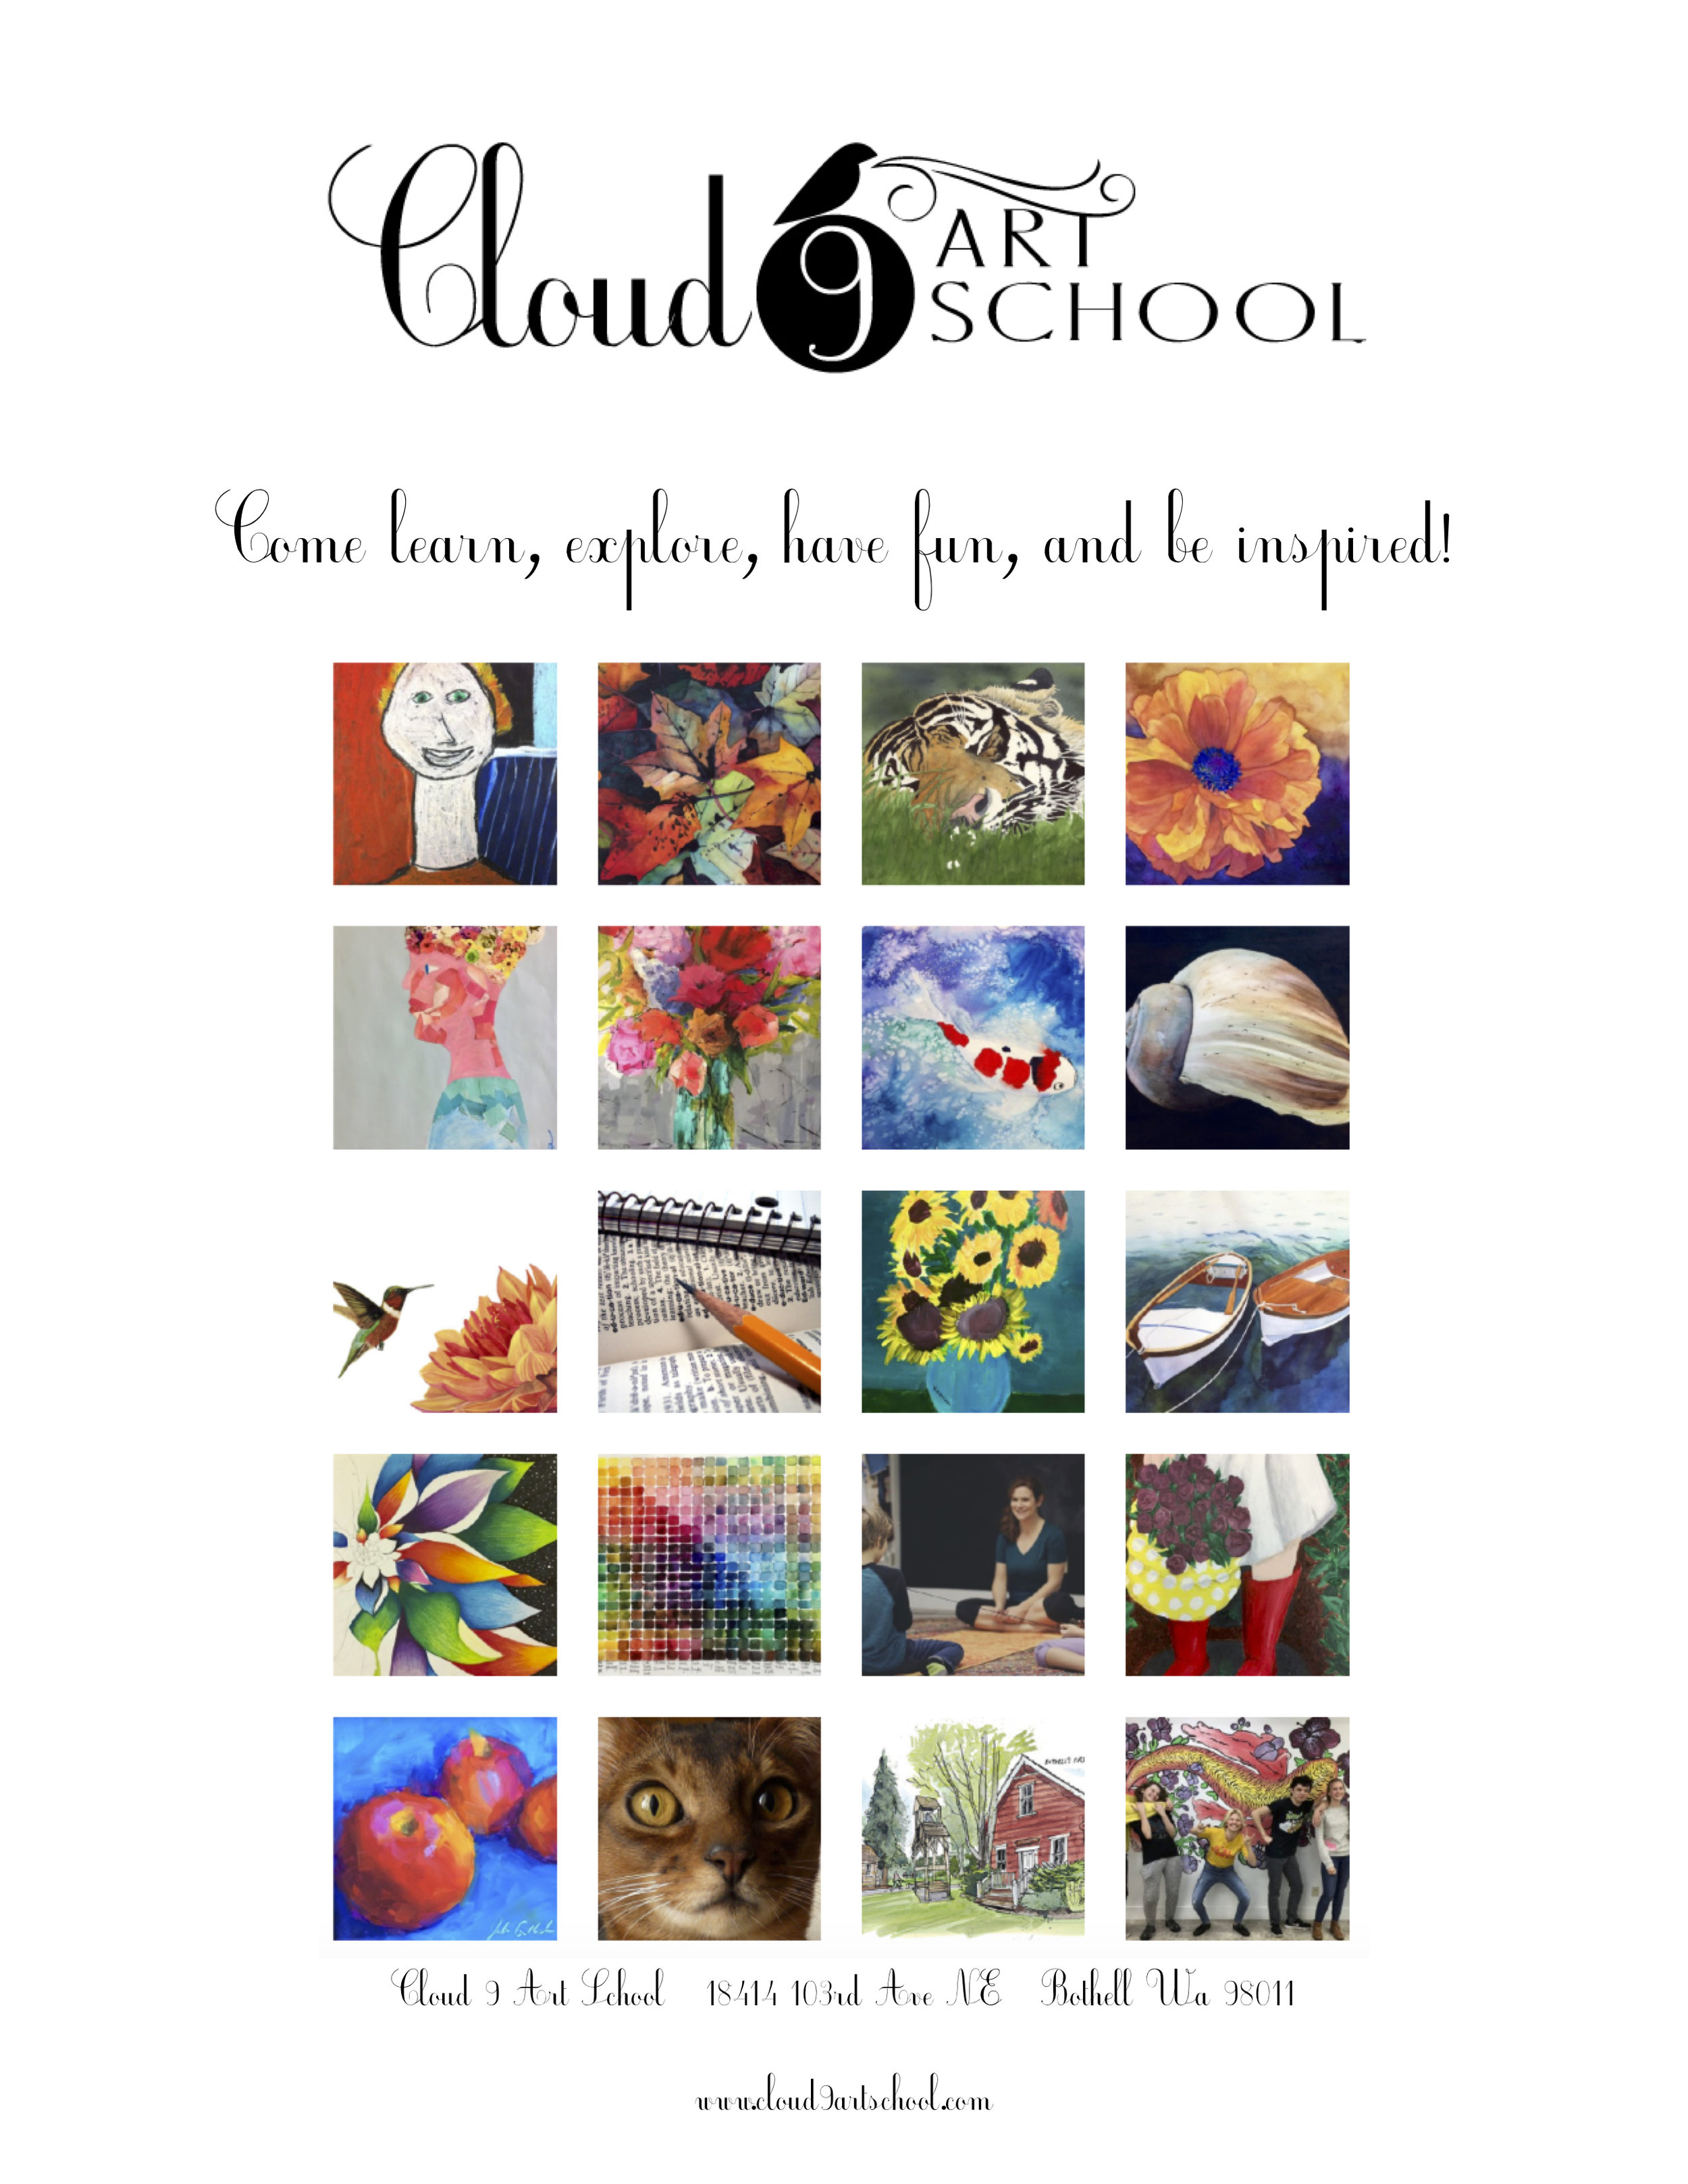 Cloud 9 Catalog.jpg